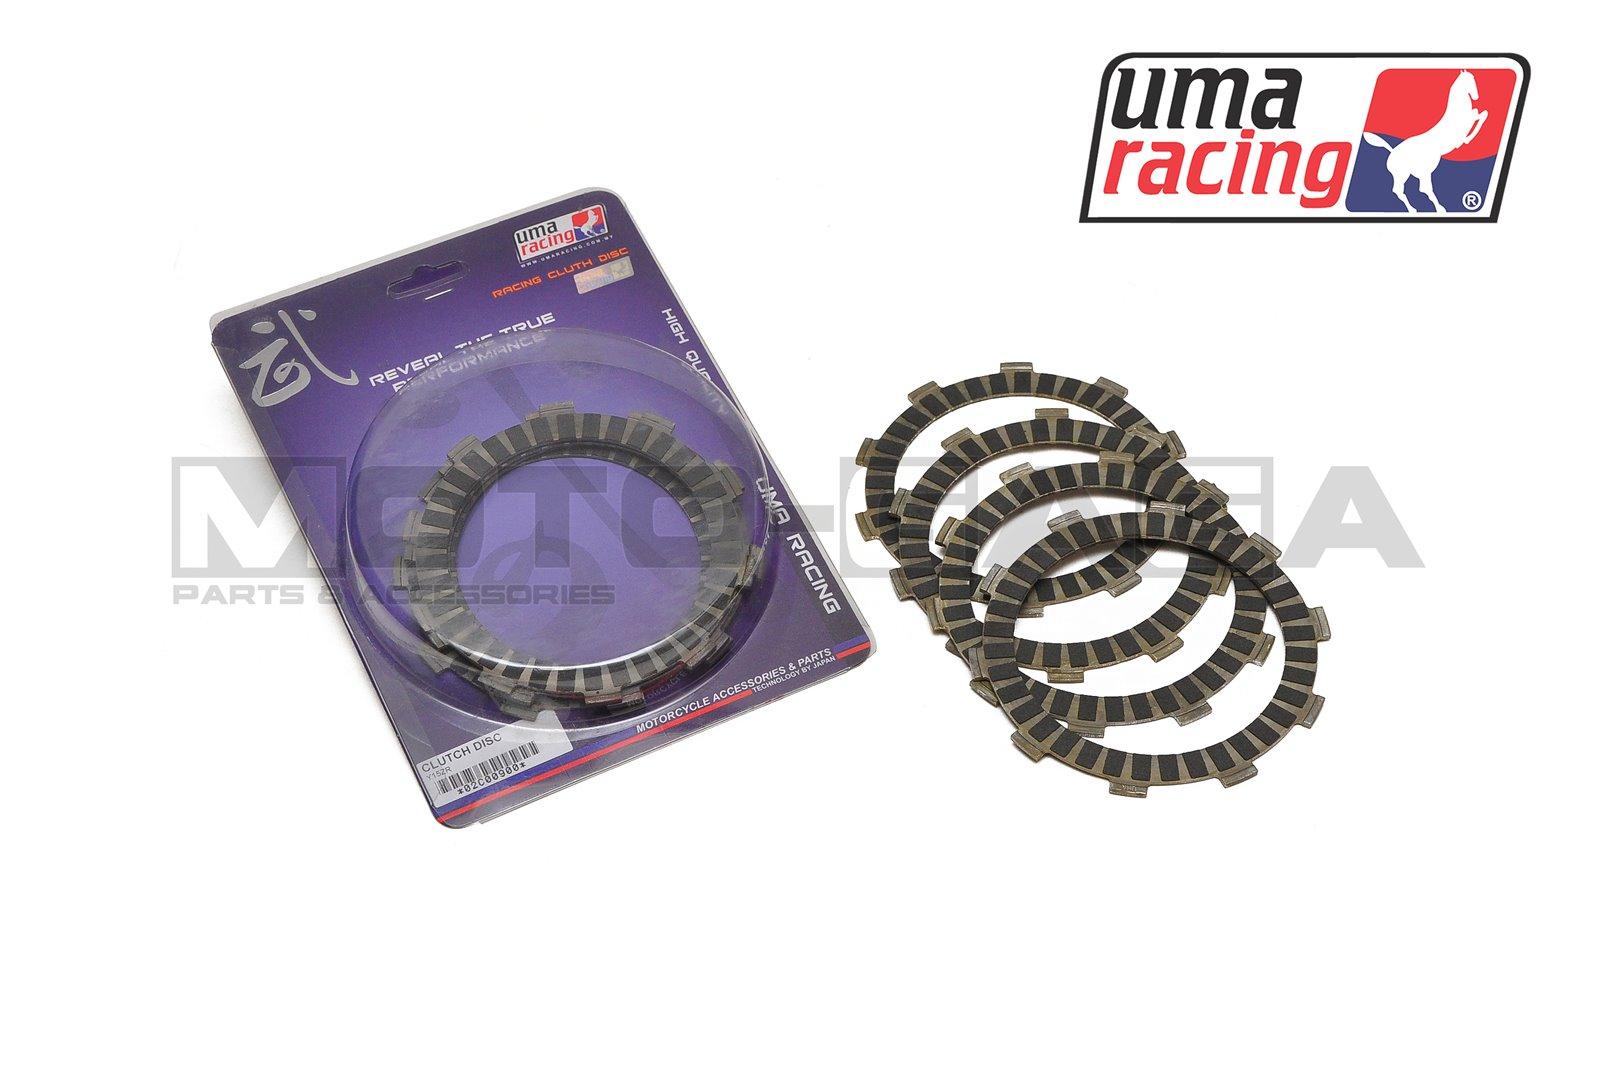 UMA Racing Friction Clutch Plates - Yamaha Fz150i Vixion (2014-17)